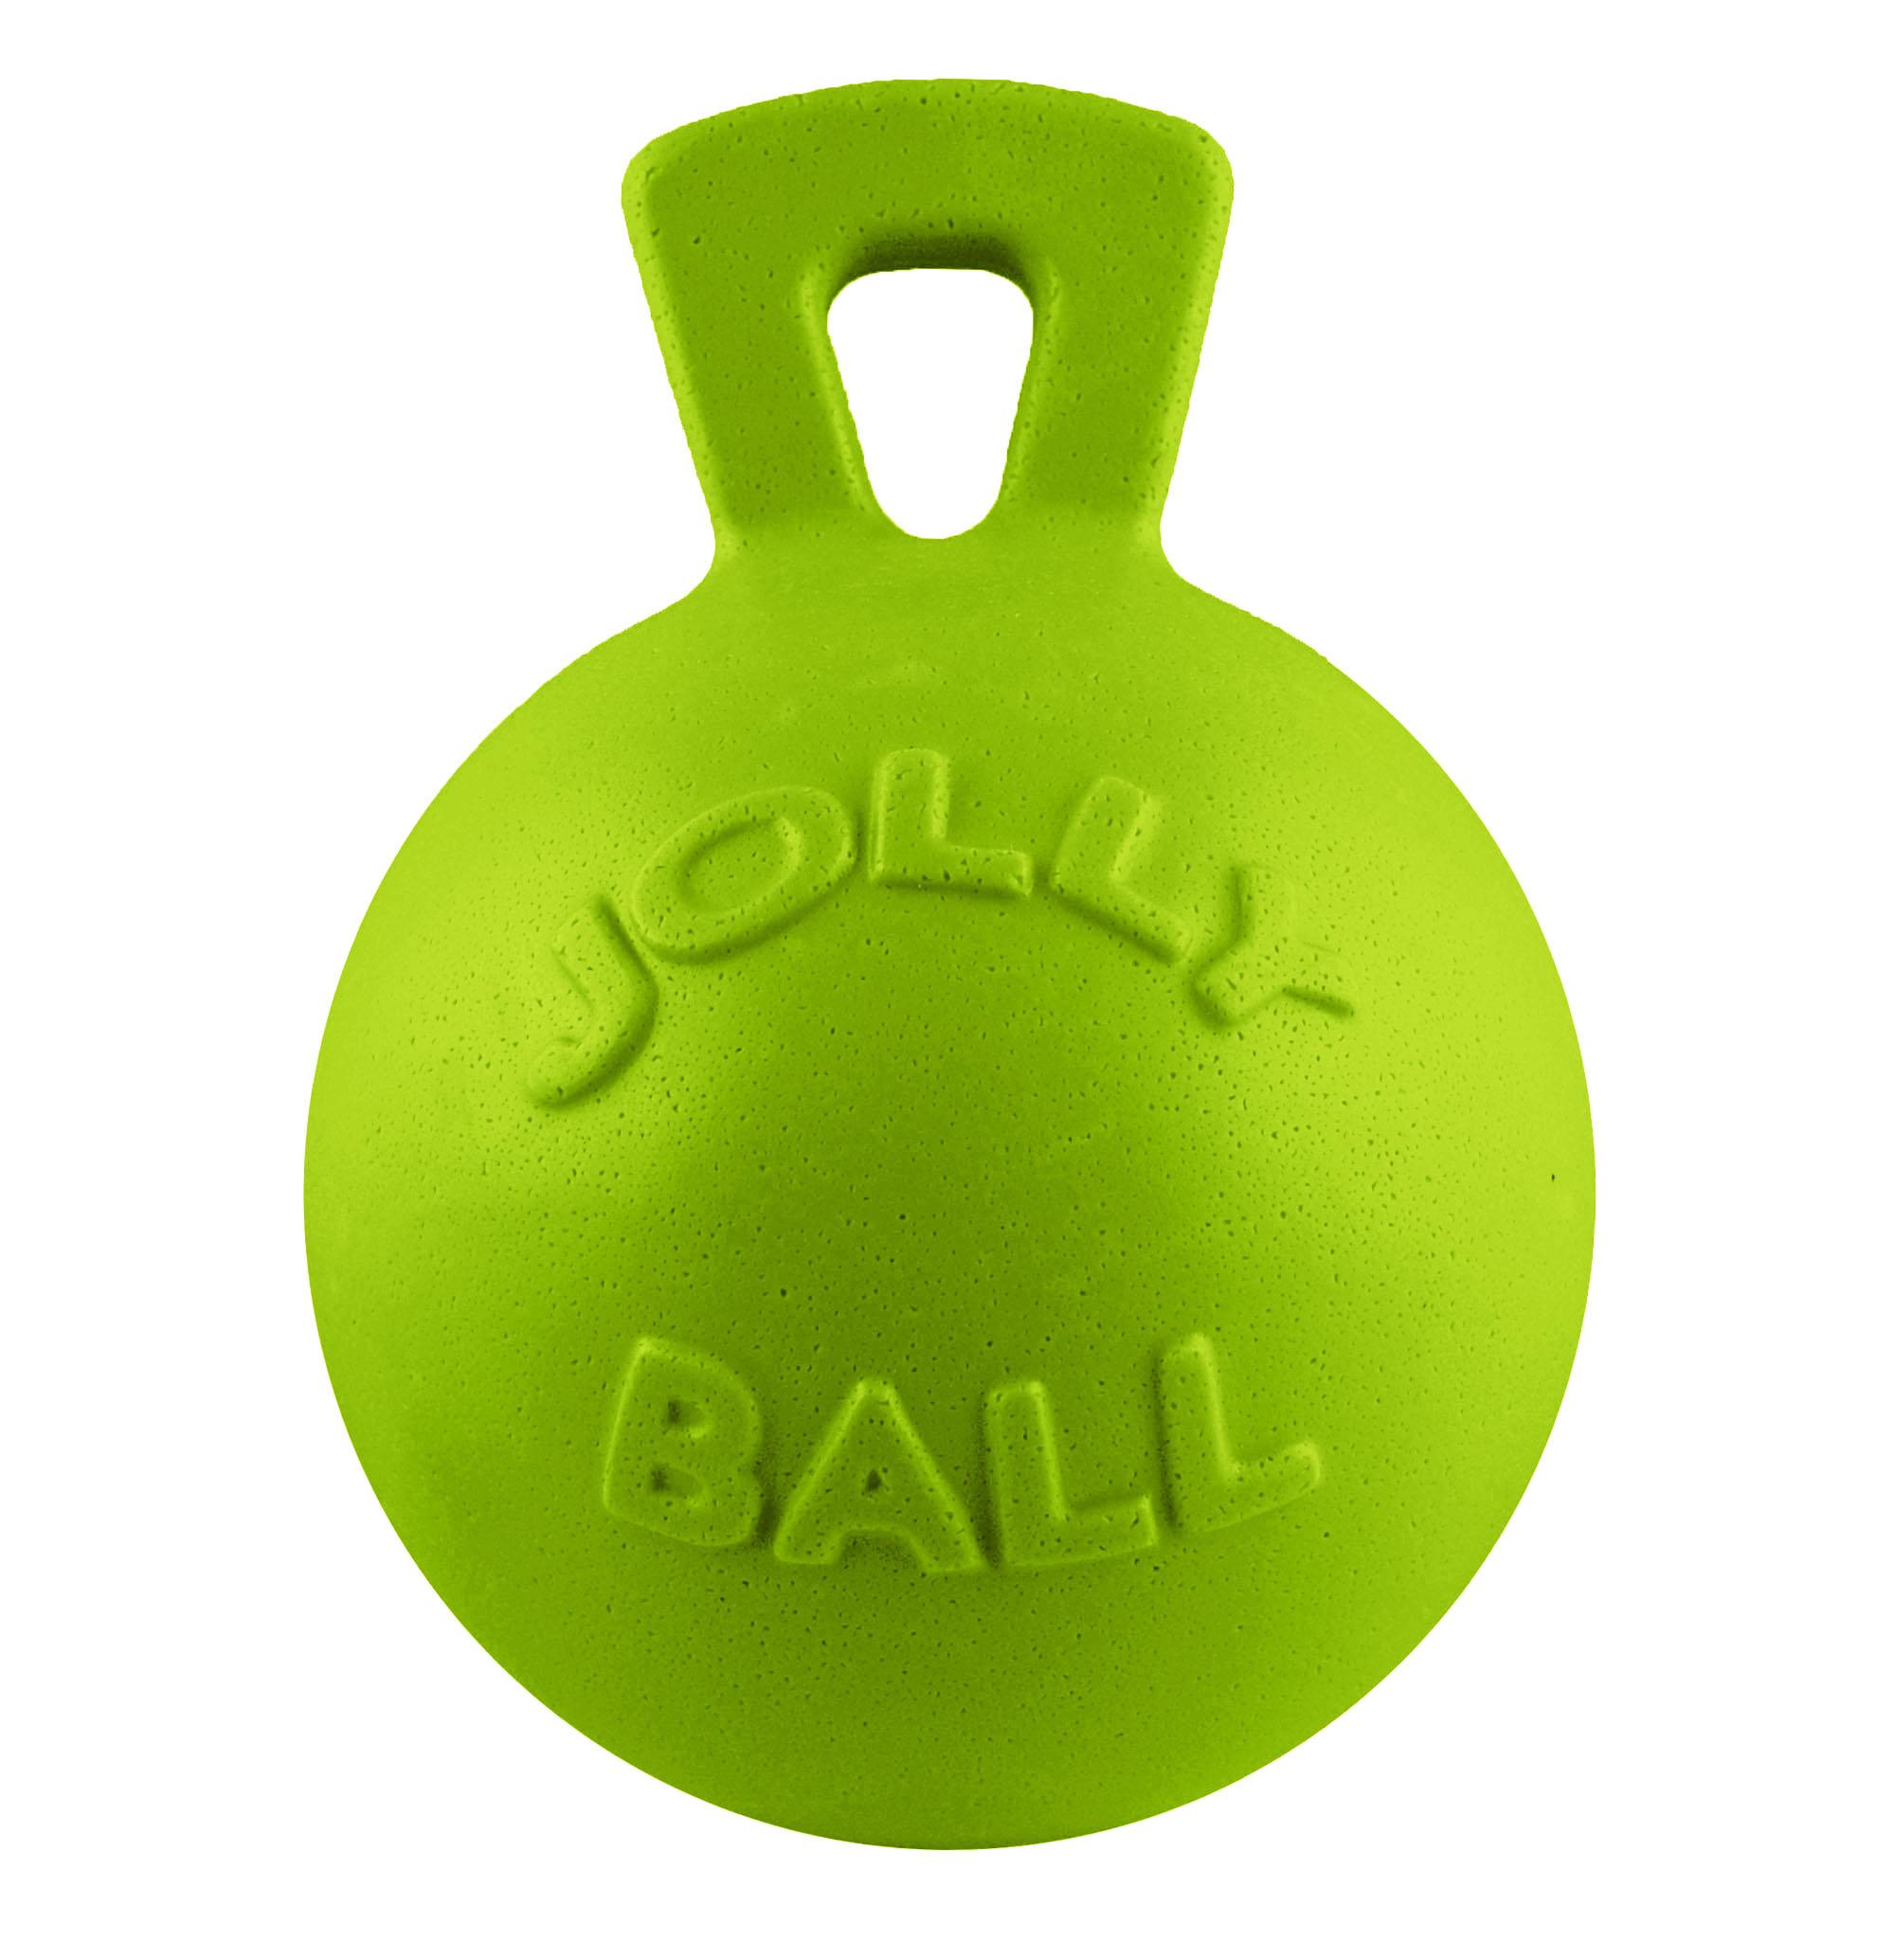 Jolly Pets Tug-n-Toss Dog Toy, Green Apple